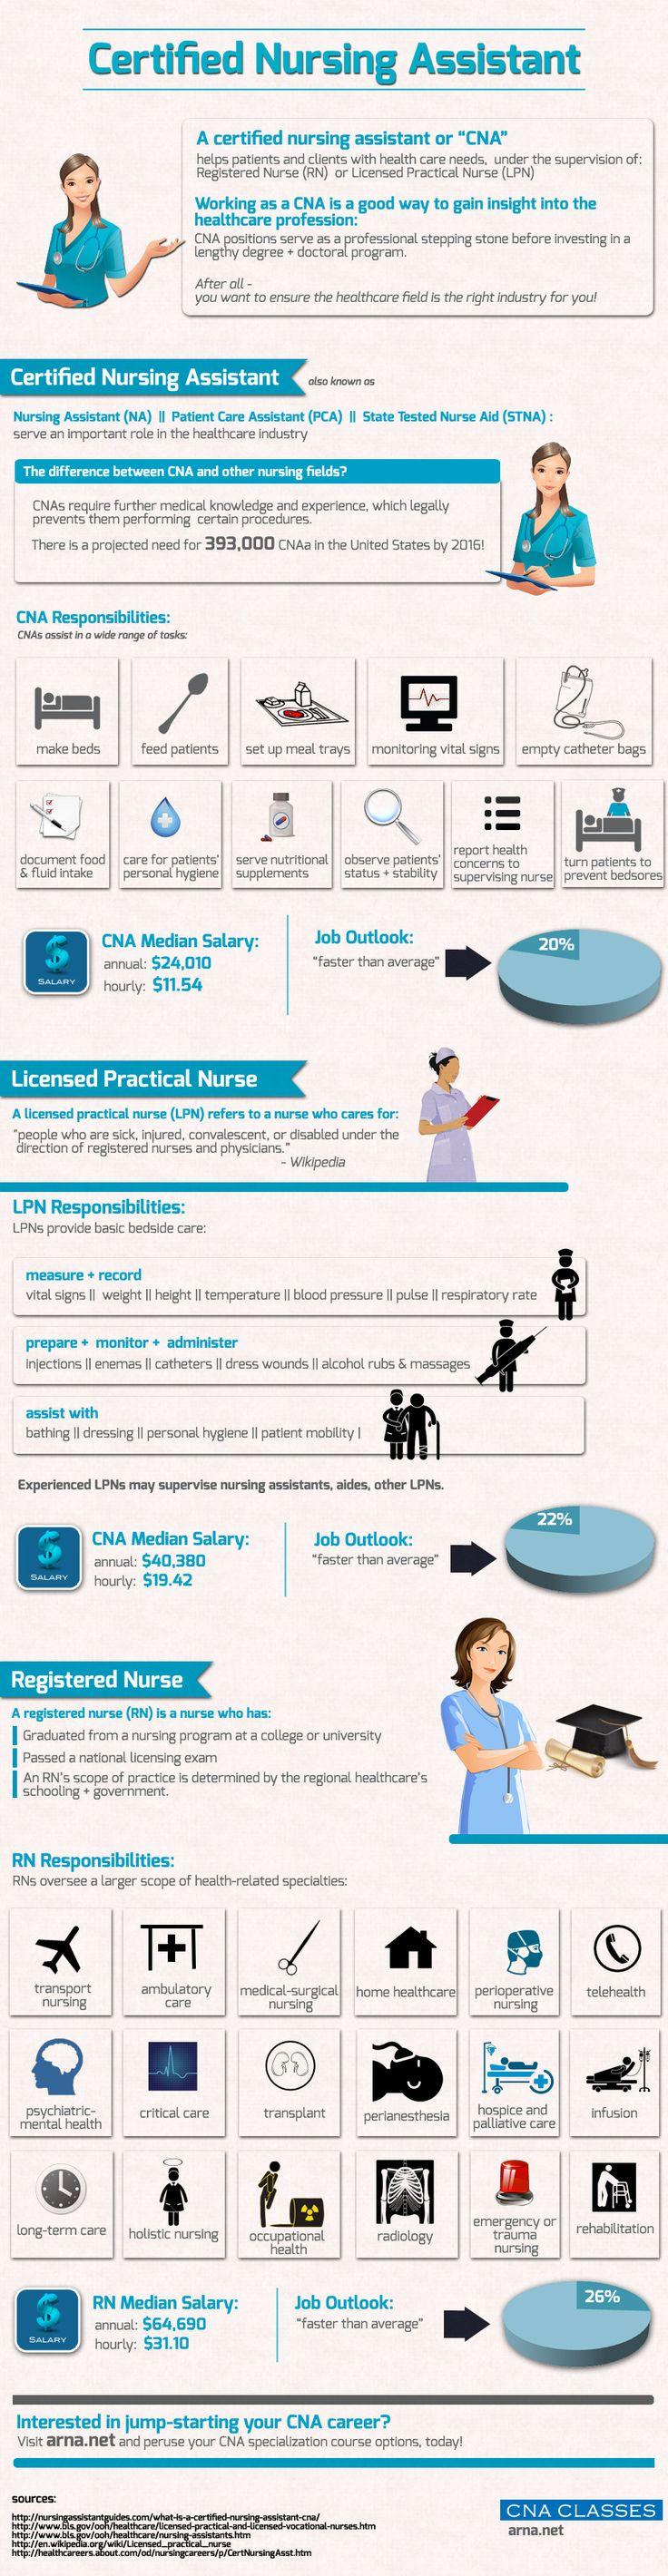 11 Main Responsibilities of a Certified Nursing Assistant - HealthRF